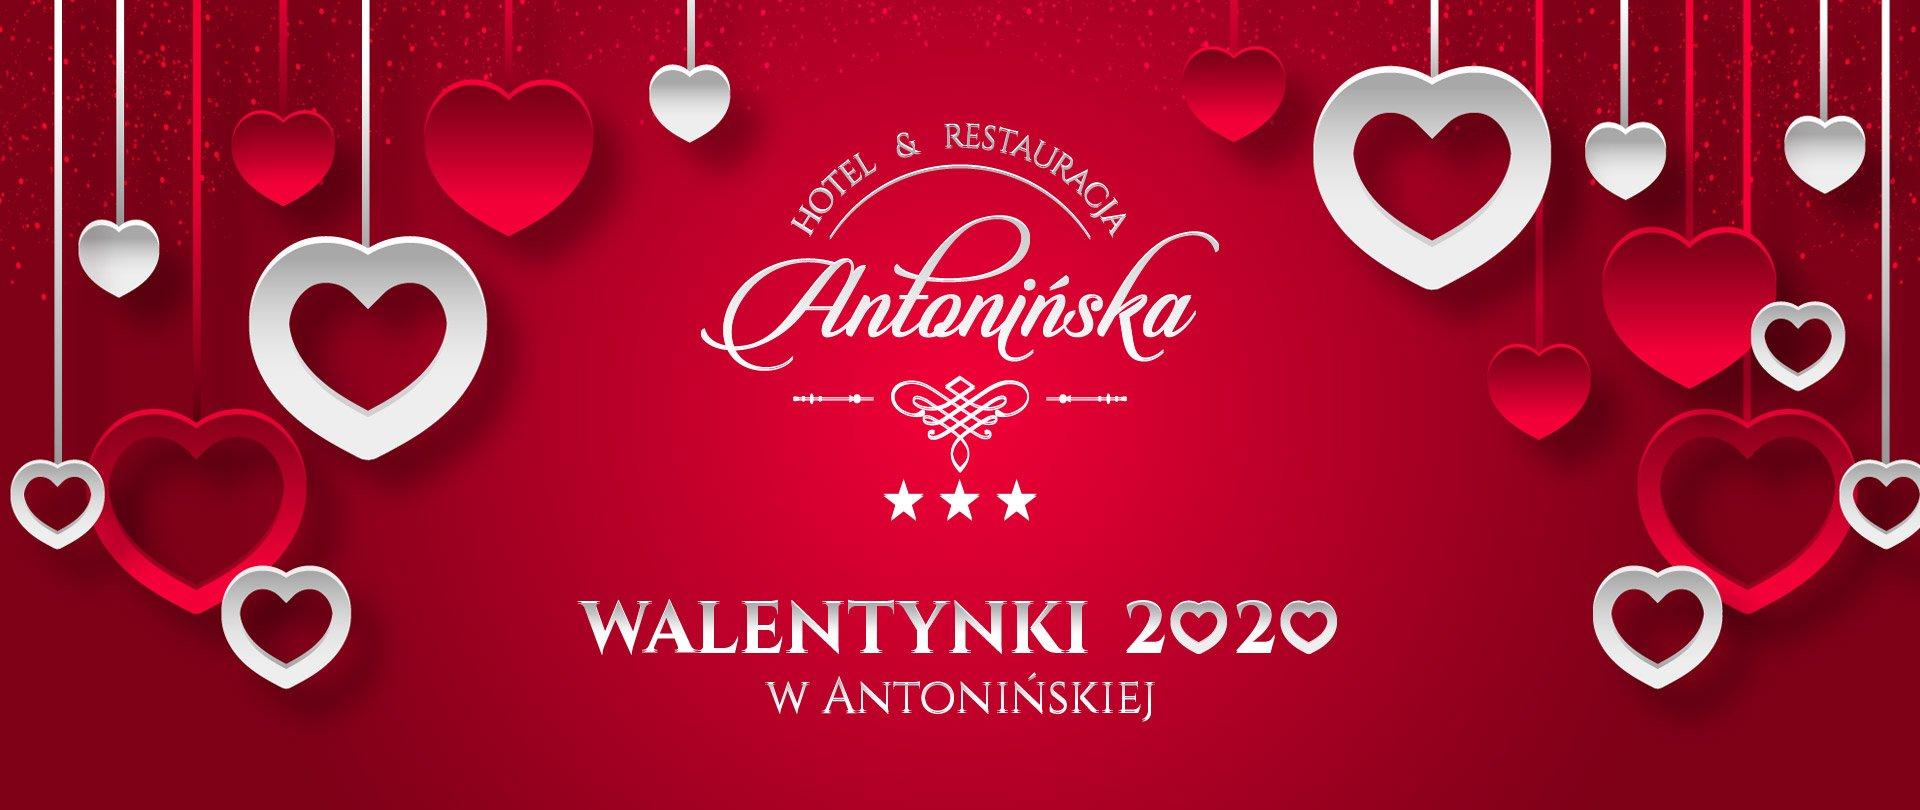 Valentine's Day 2020 at Antonińska